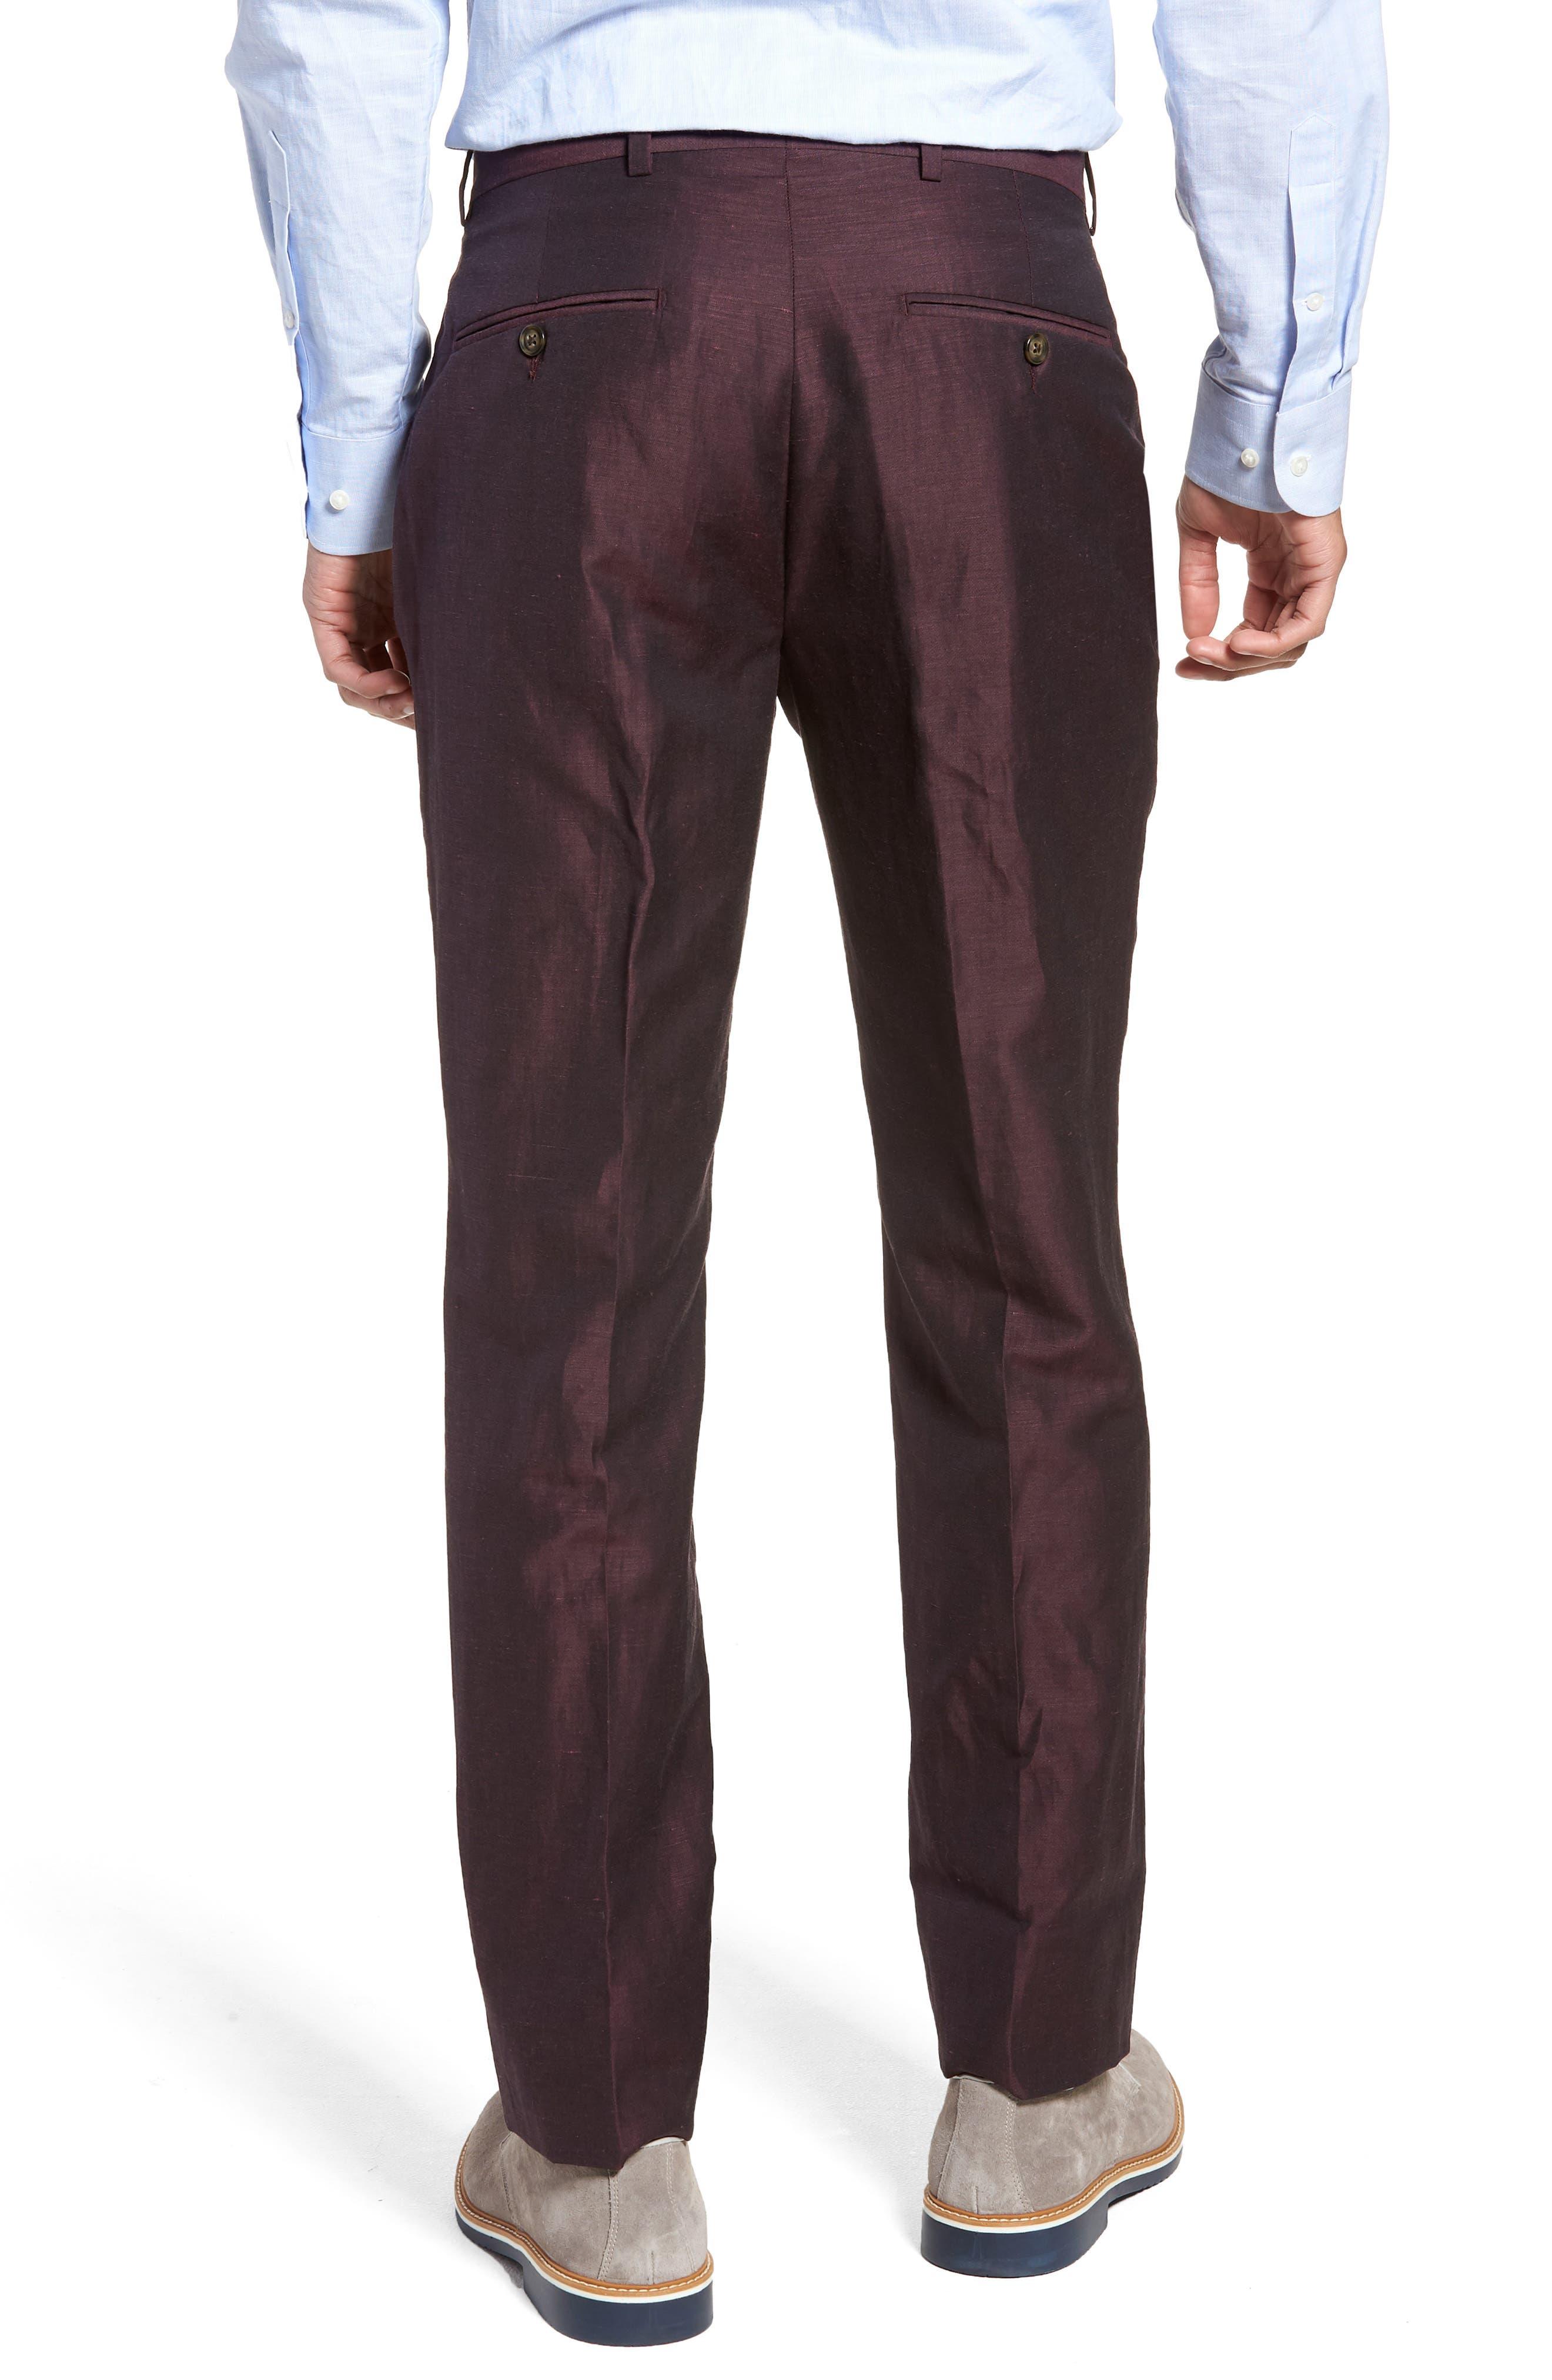 Dagger Flat Front Solid Wool & Linen Trousers,                             Alternate thumbnail 2, color,                             Plum